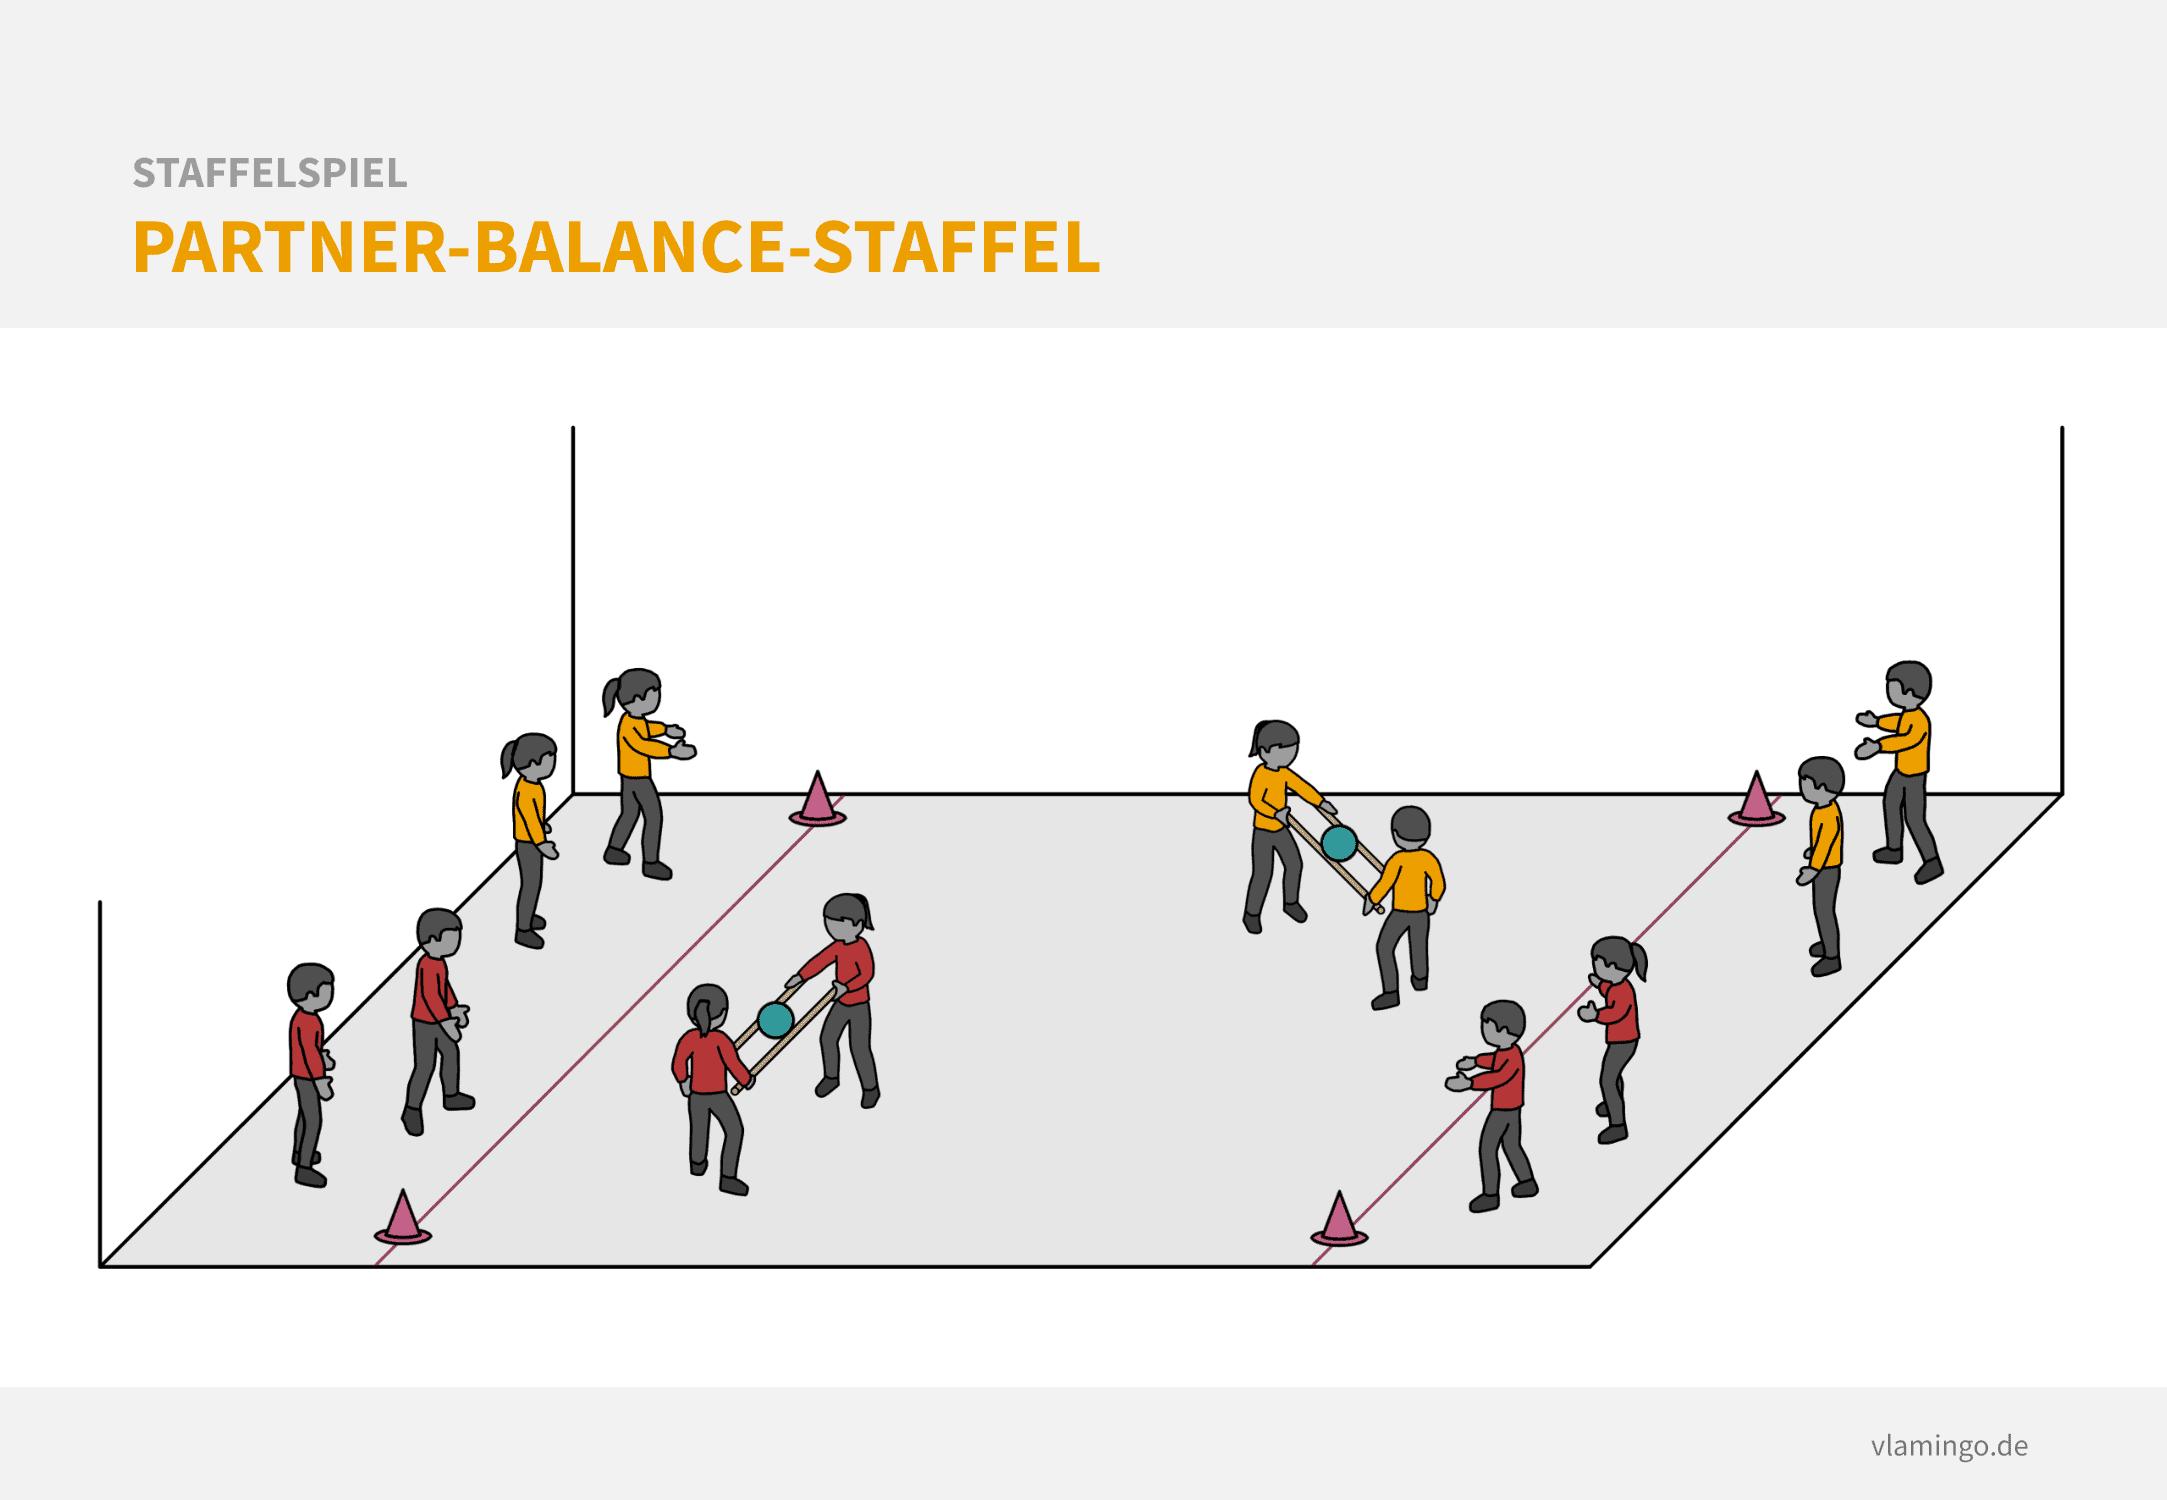 Staffelspiel - Partner-Balance-Staffel